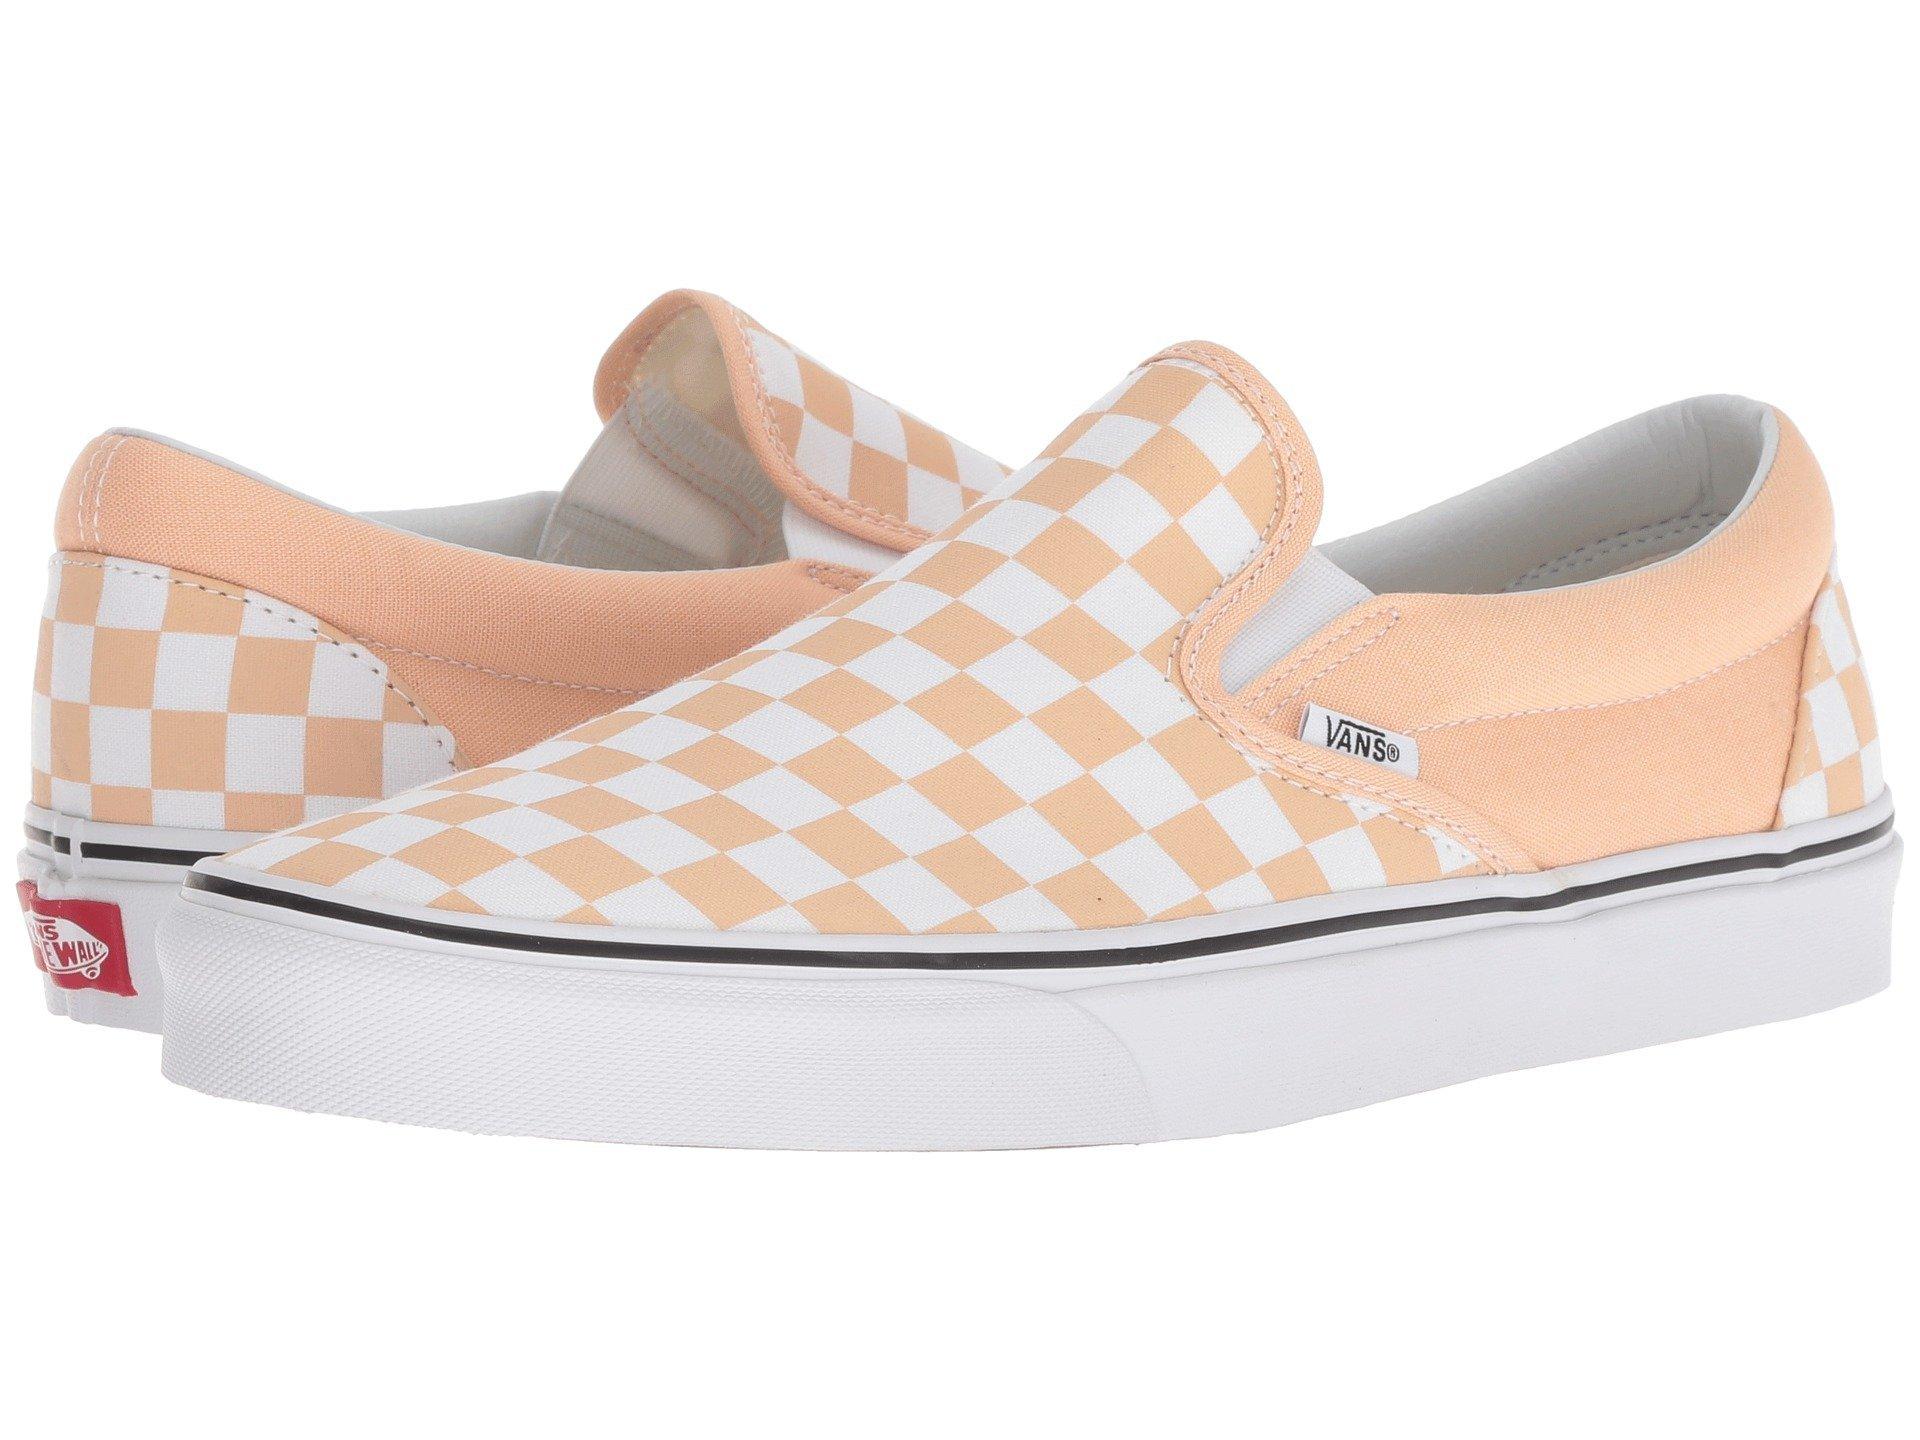 2b5db9f1a3 Vans Unisex Checkerboard Slip-On Skate Shoes (40.5 M EU   9.5 B(M) US Women    8 D(M) US Men